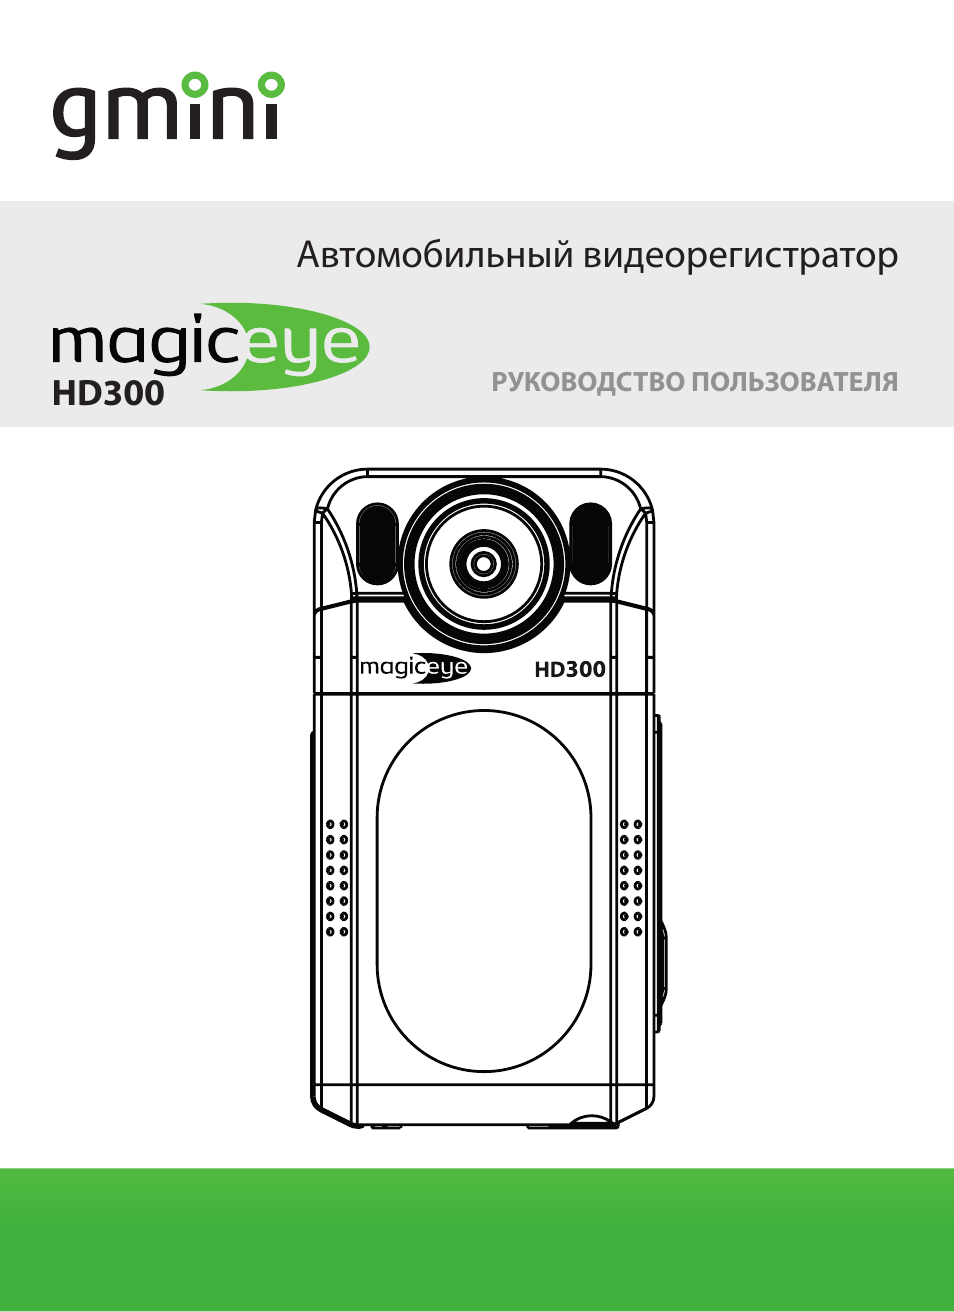 Инструкция По Эксплуатации Magiceue Nd70g